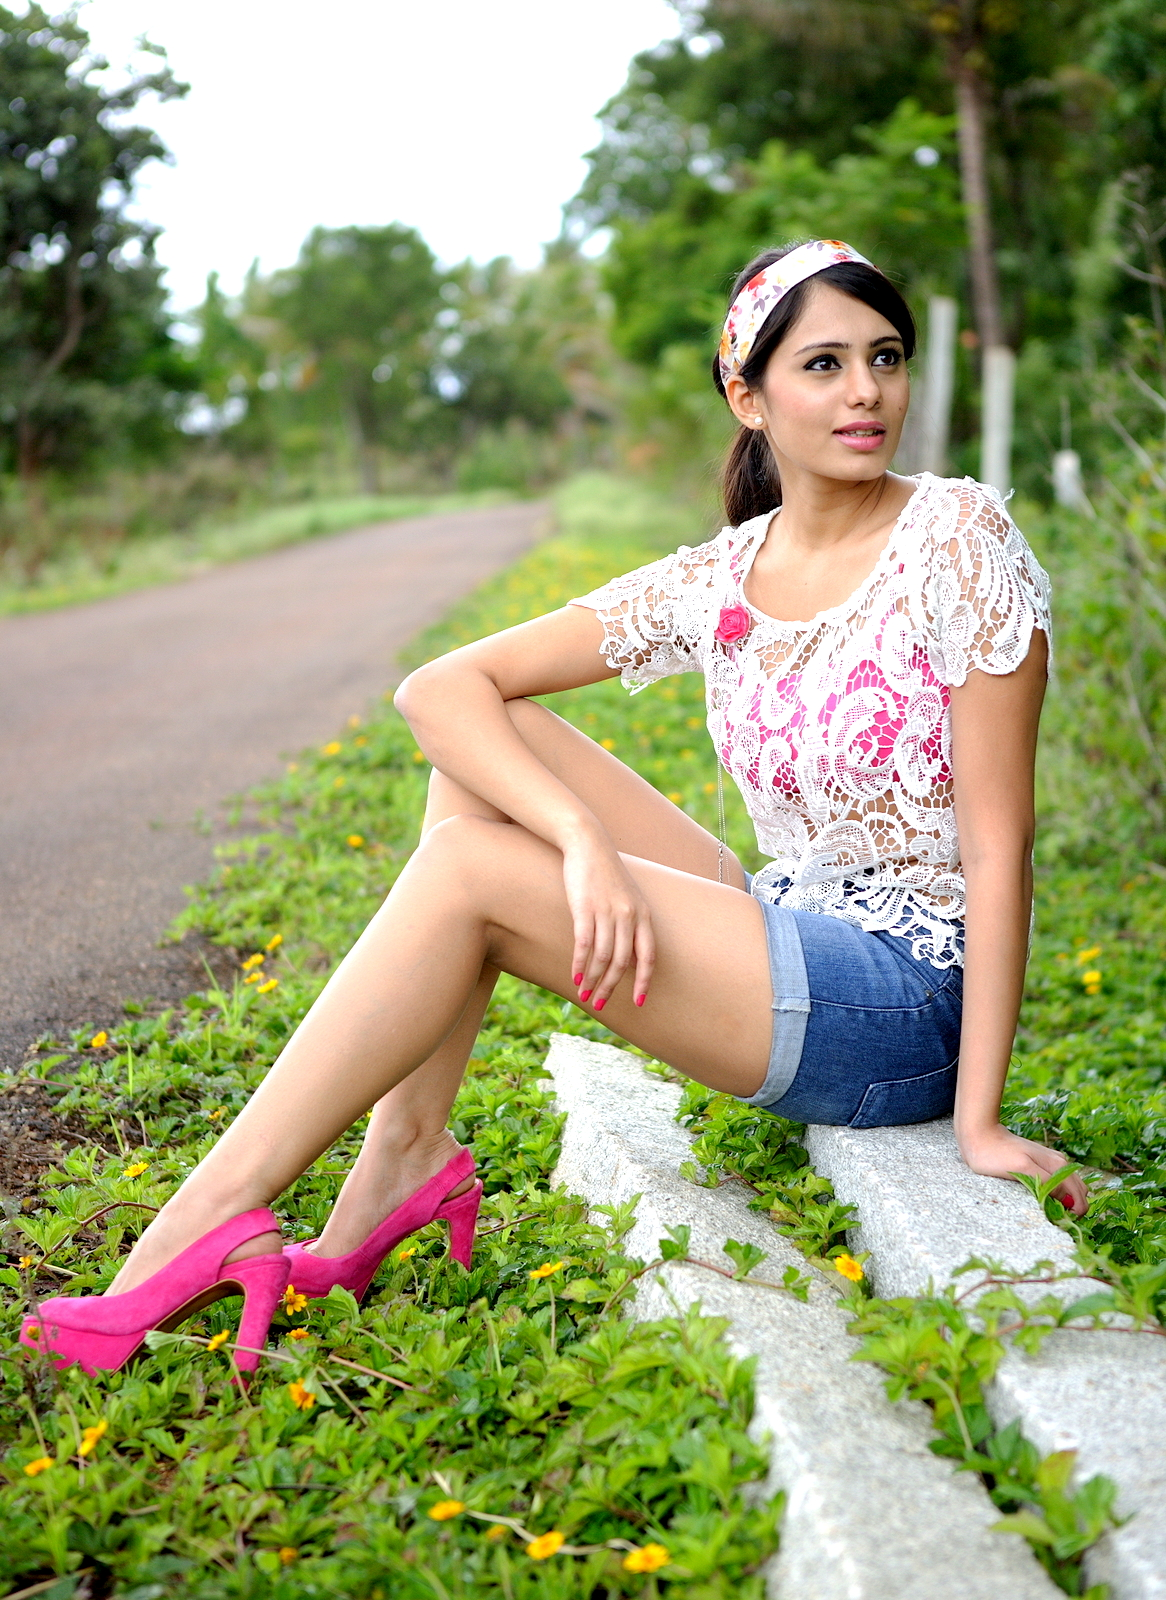 Rachana Banerjee Sexy Photo